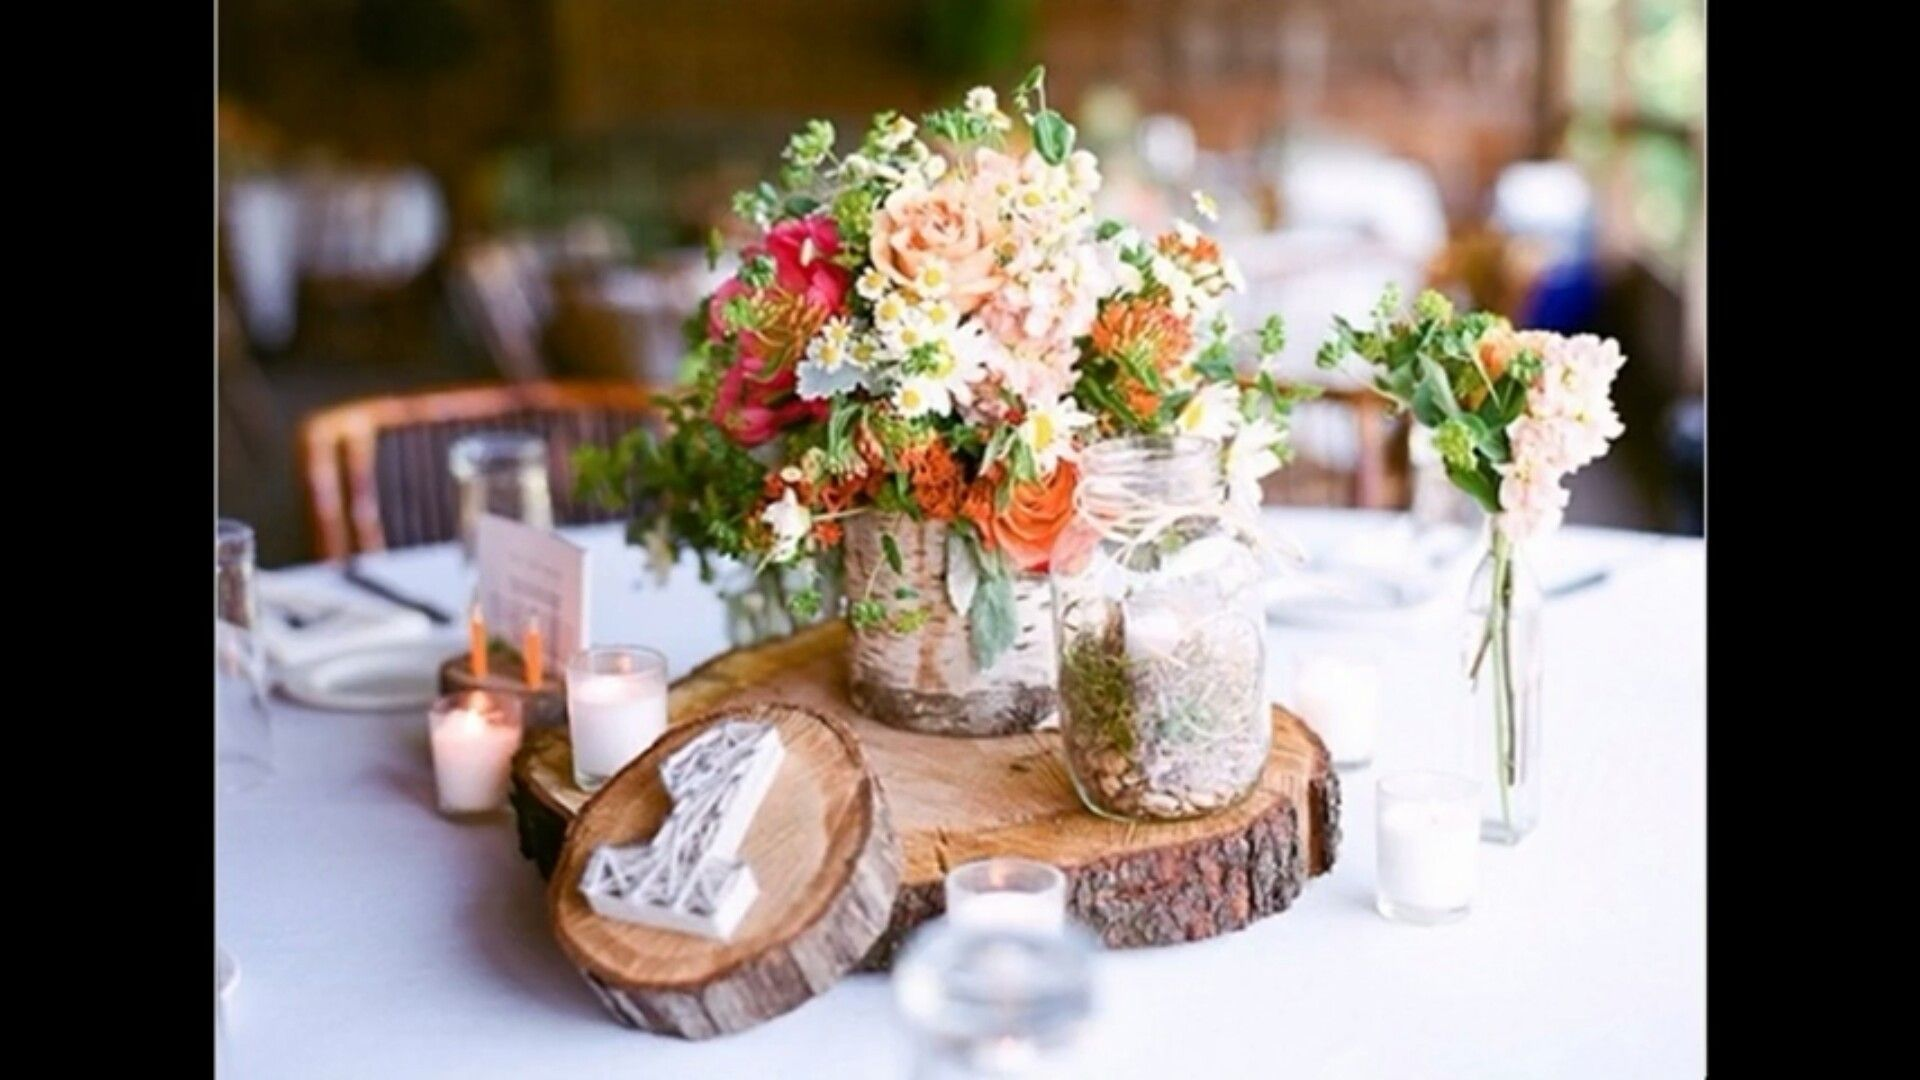 Pin by Jessica💋 on Dream wedding | Pinterest | Wedding and Wedding